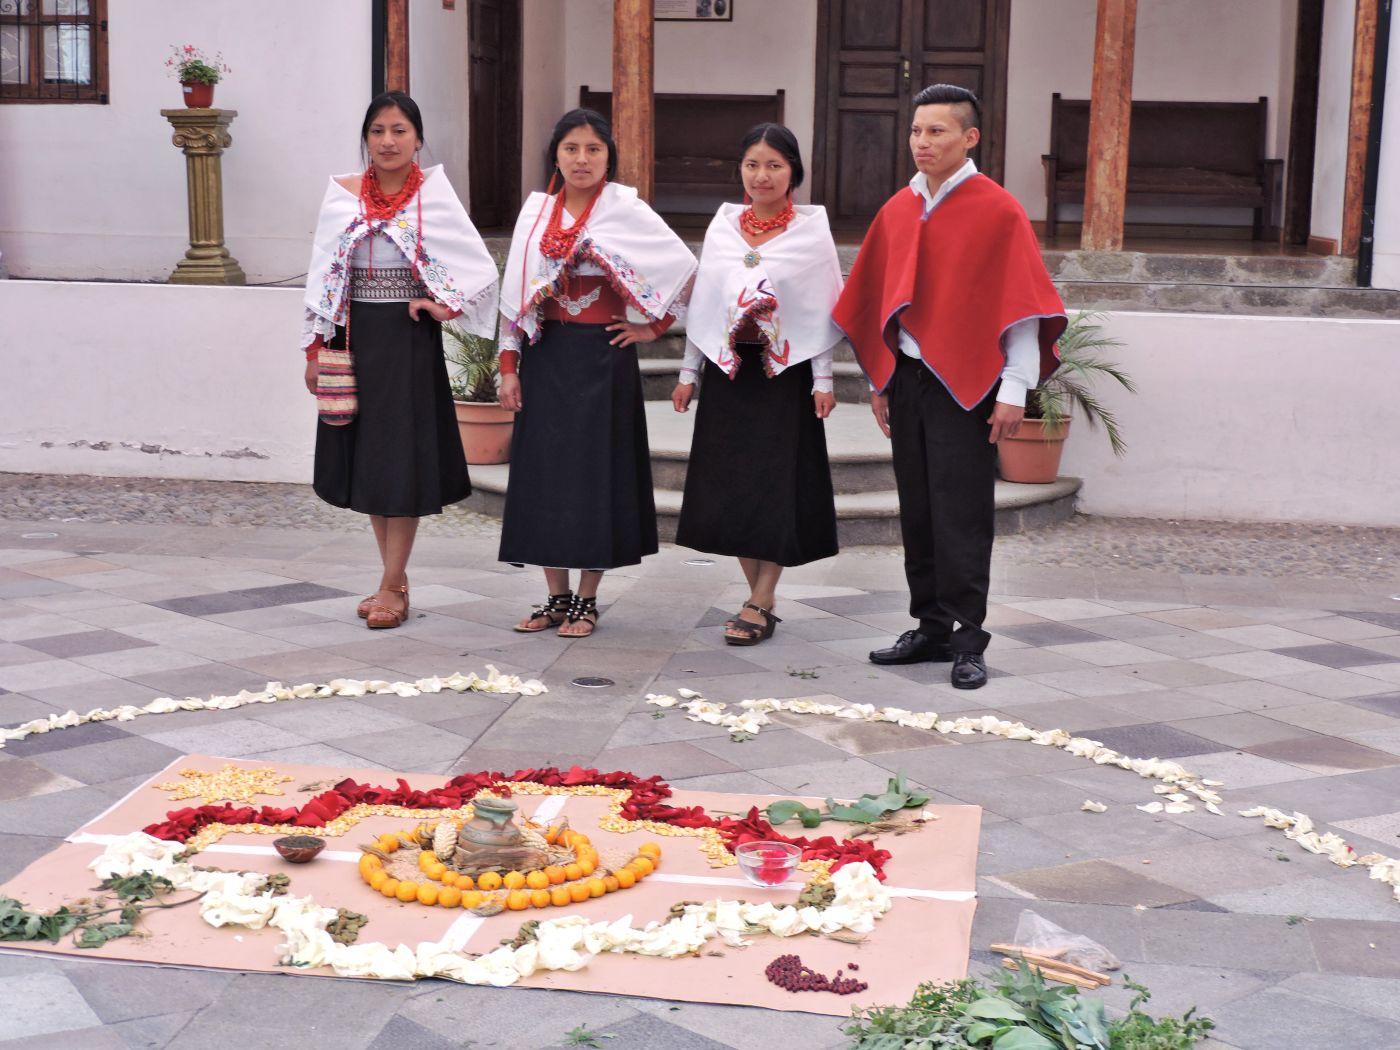 Vestimenta tradicional 'guía' al turista que visita comunidades tungurahuenses